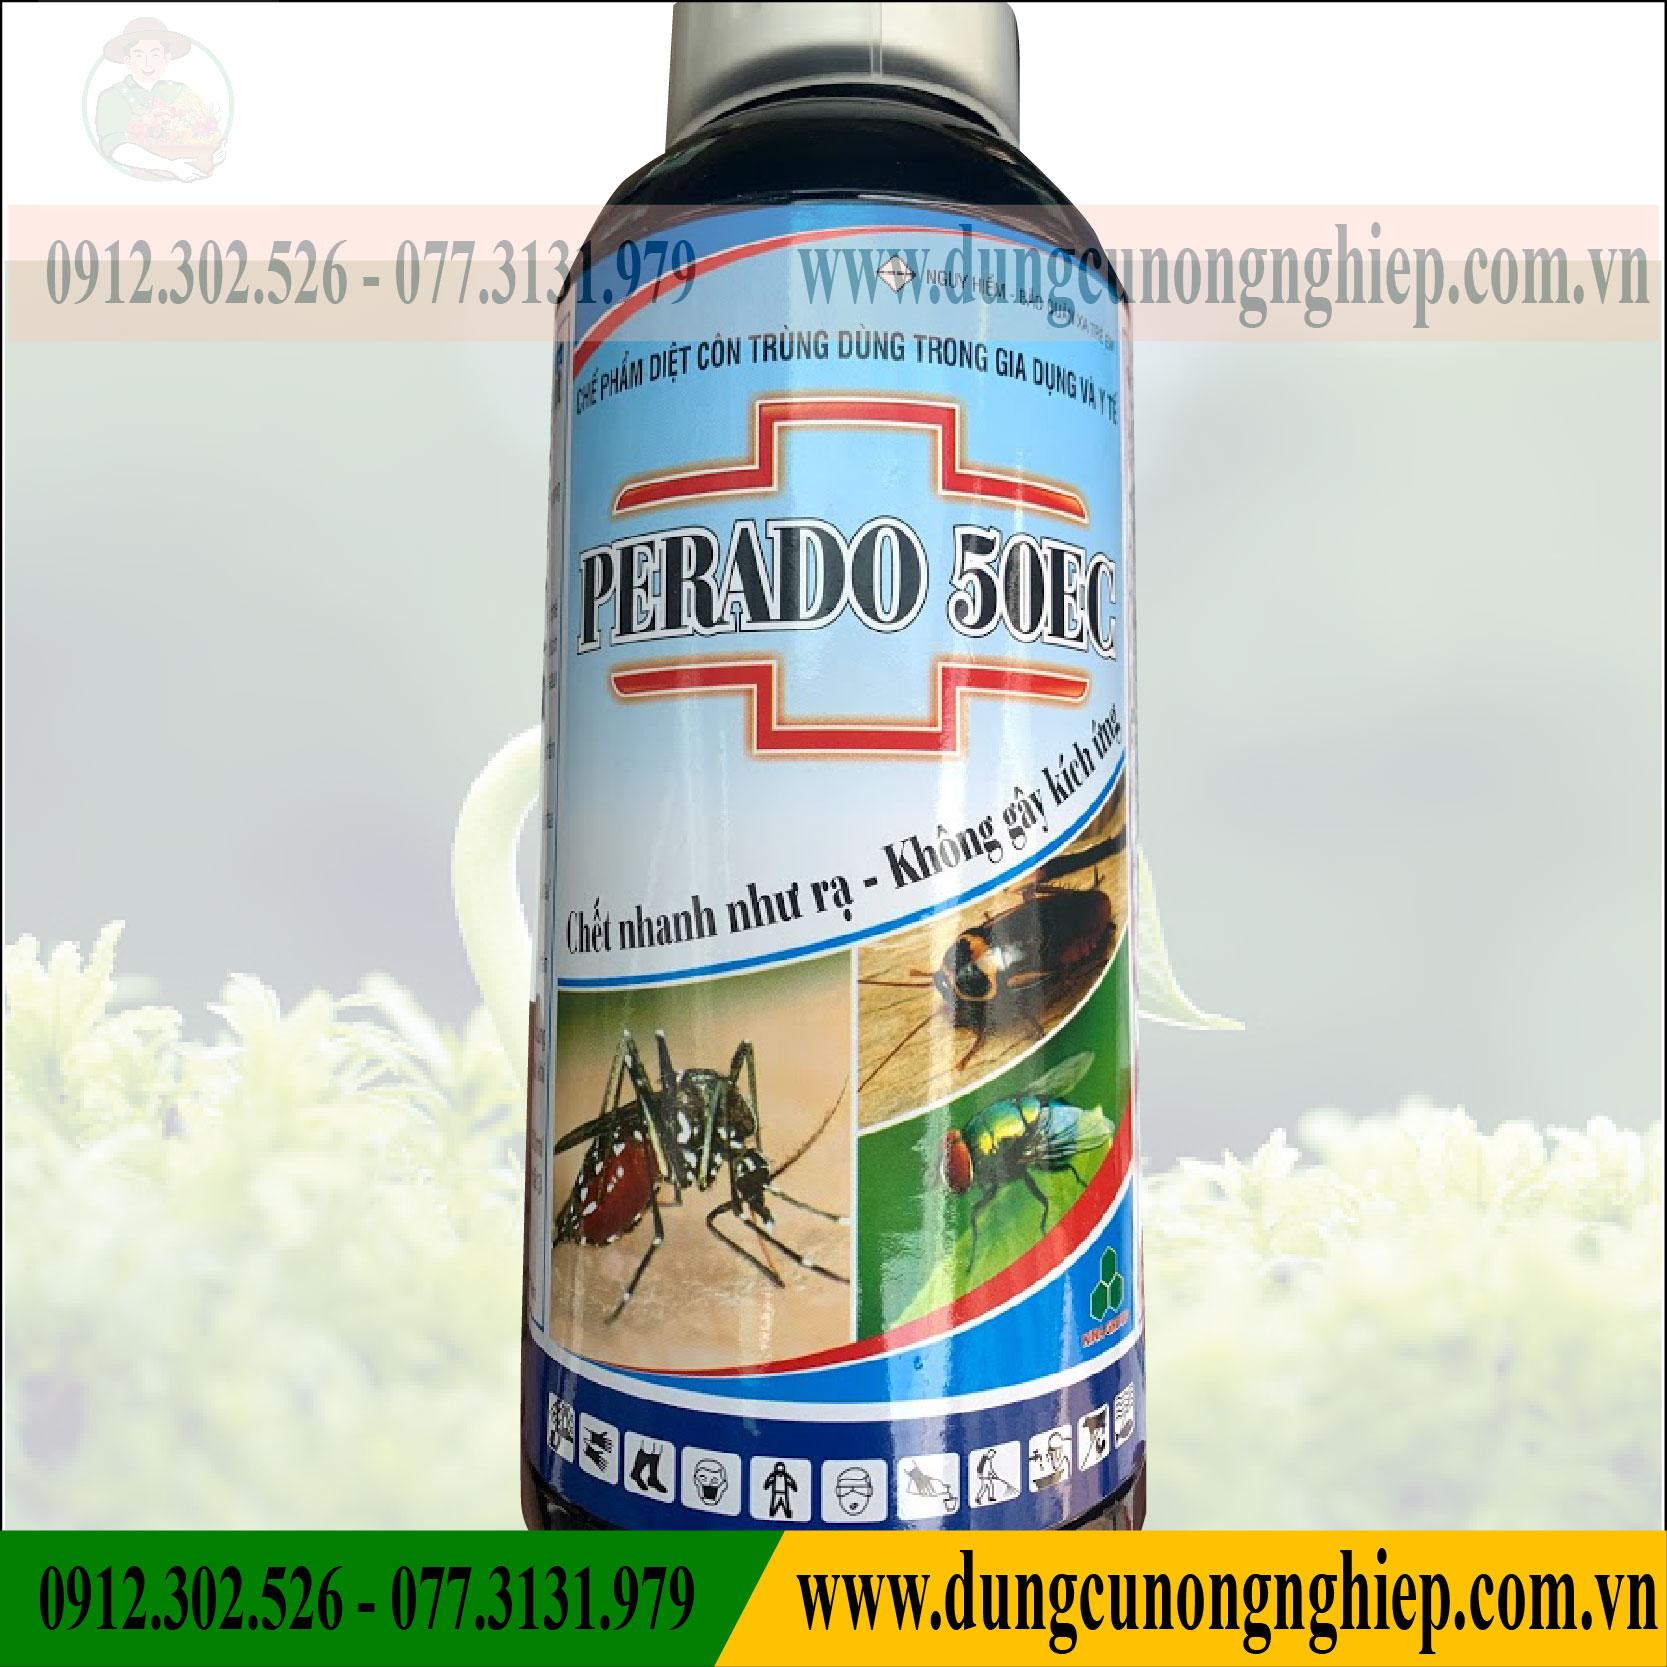 Thuốc Trừ Muỗi PERADO 50SC (1 lít)